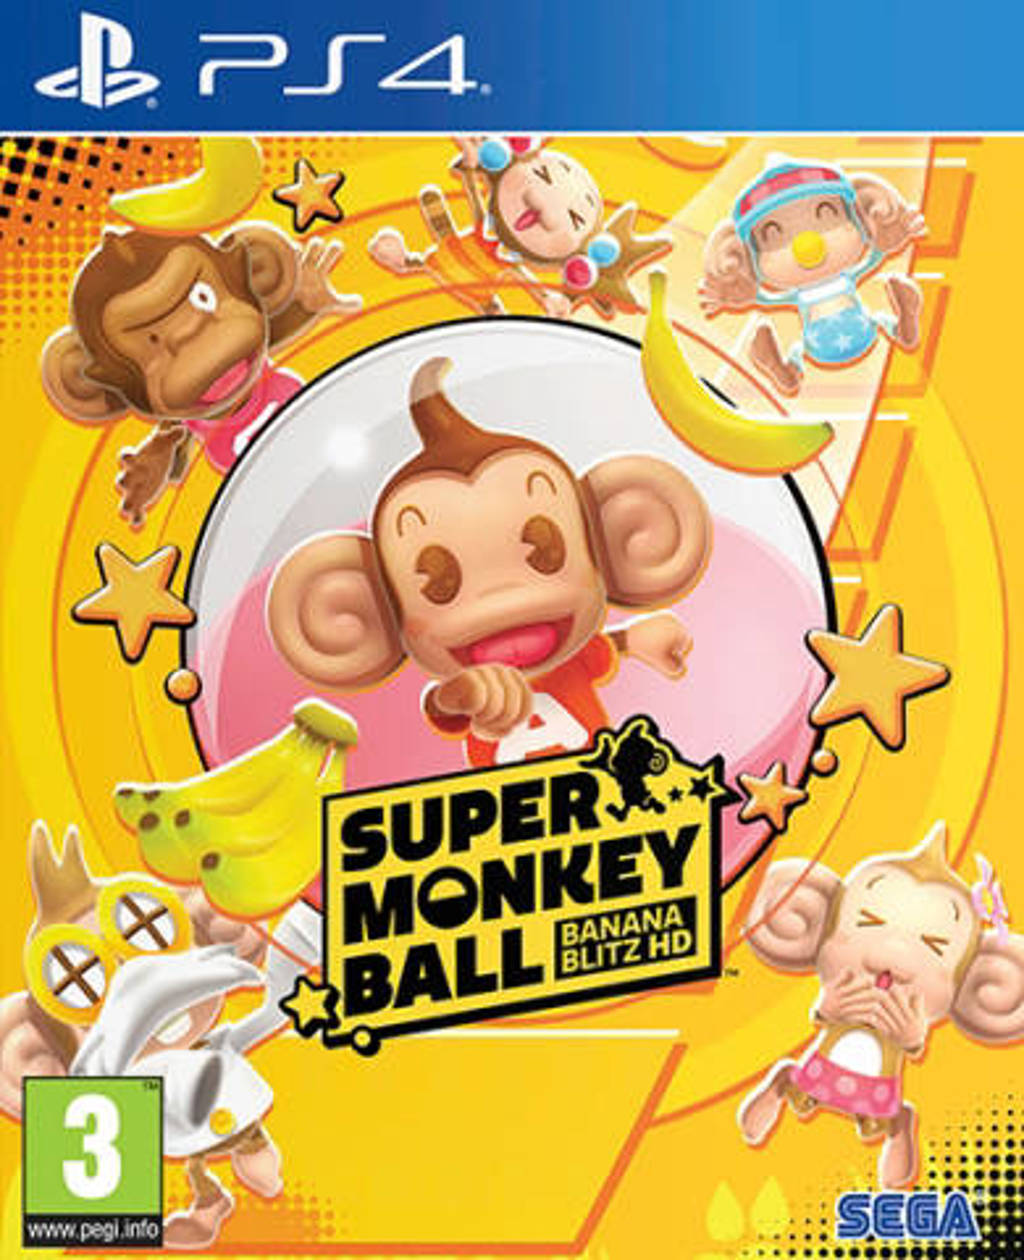 Super Monkey Ball Banana Blitz HD (Day One edition) (PlayStation 4)